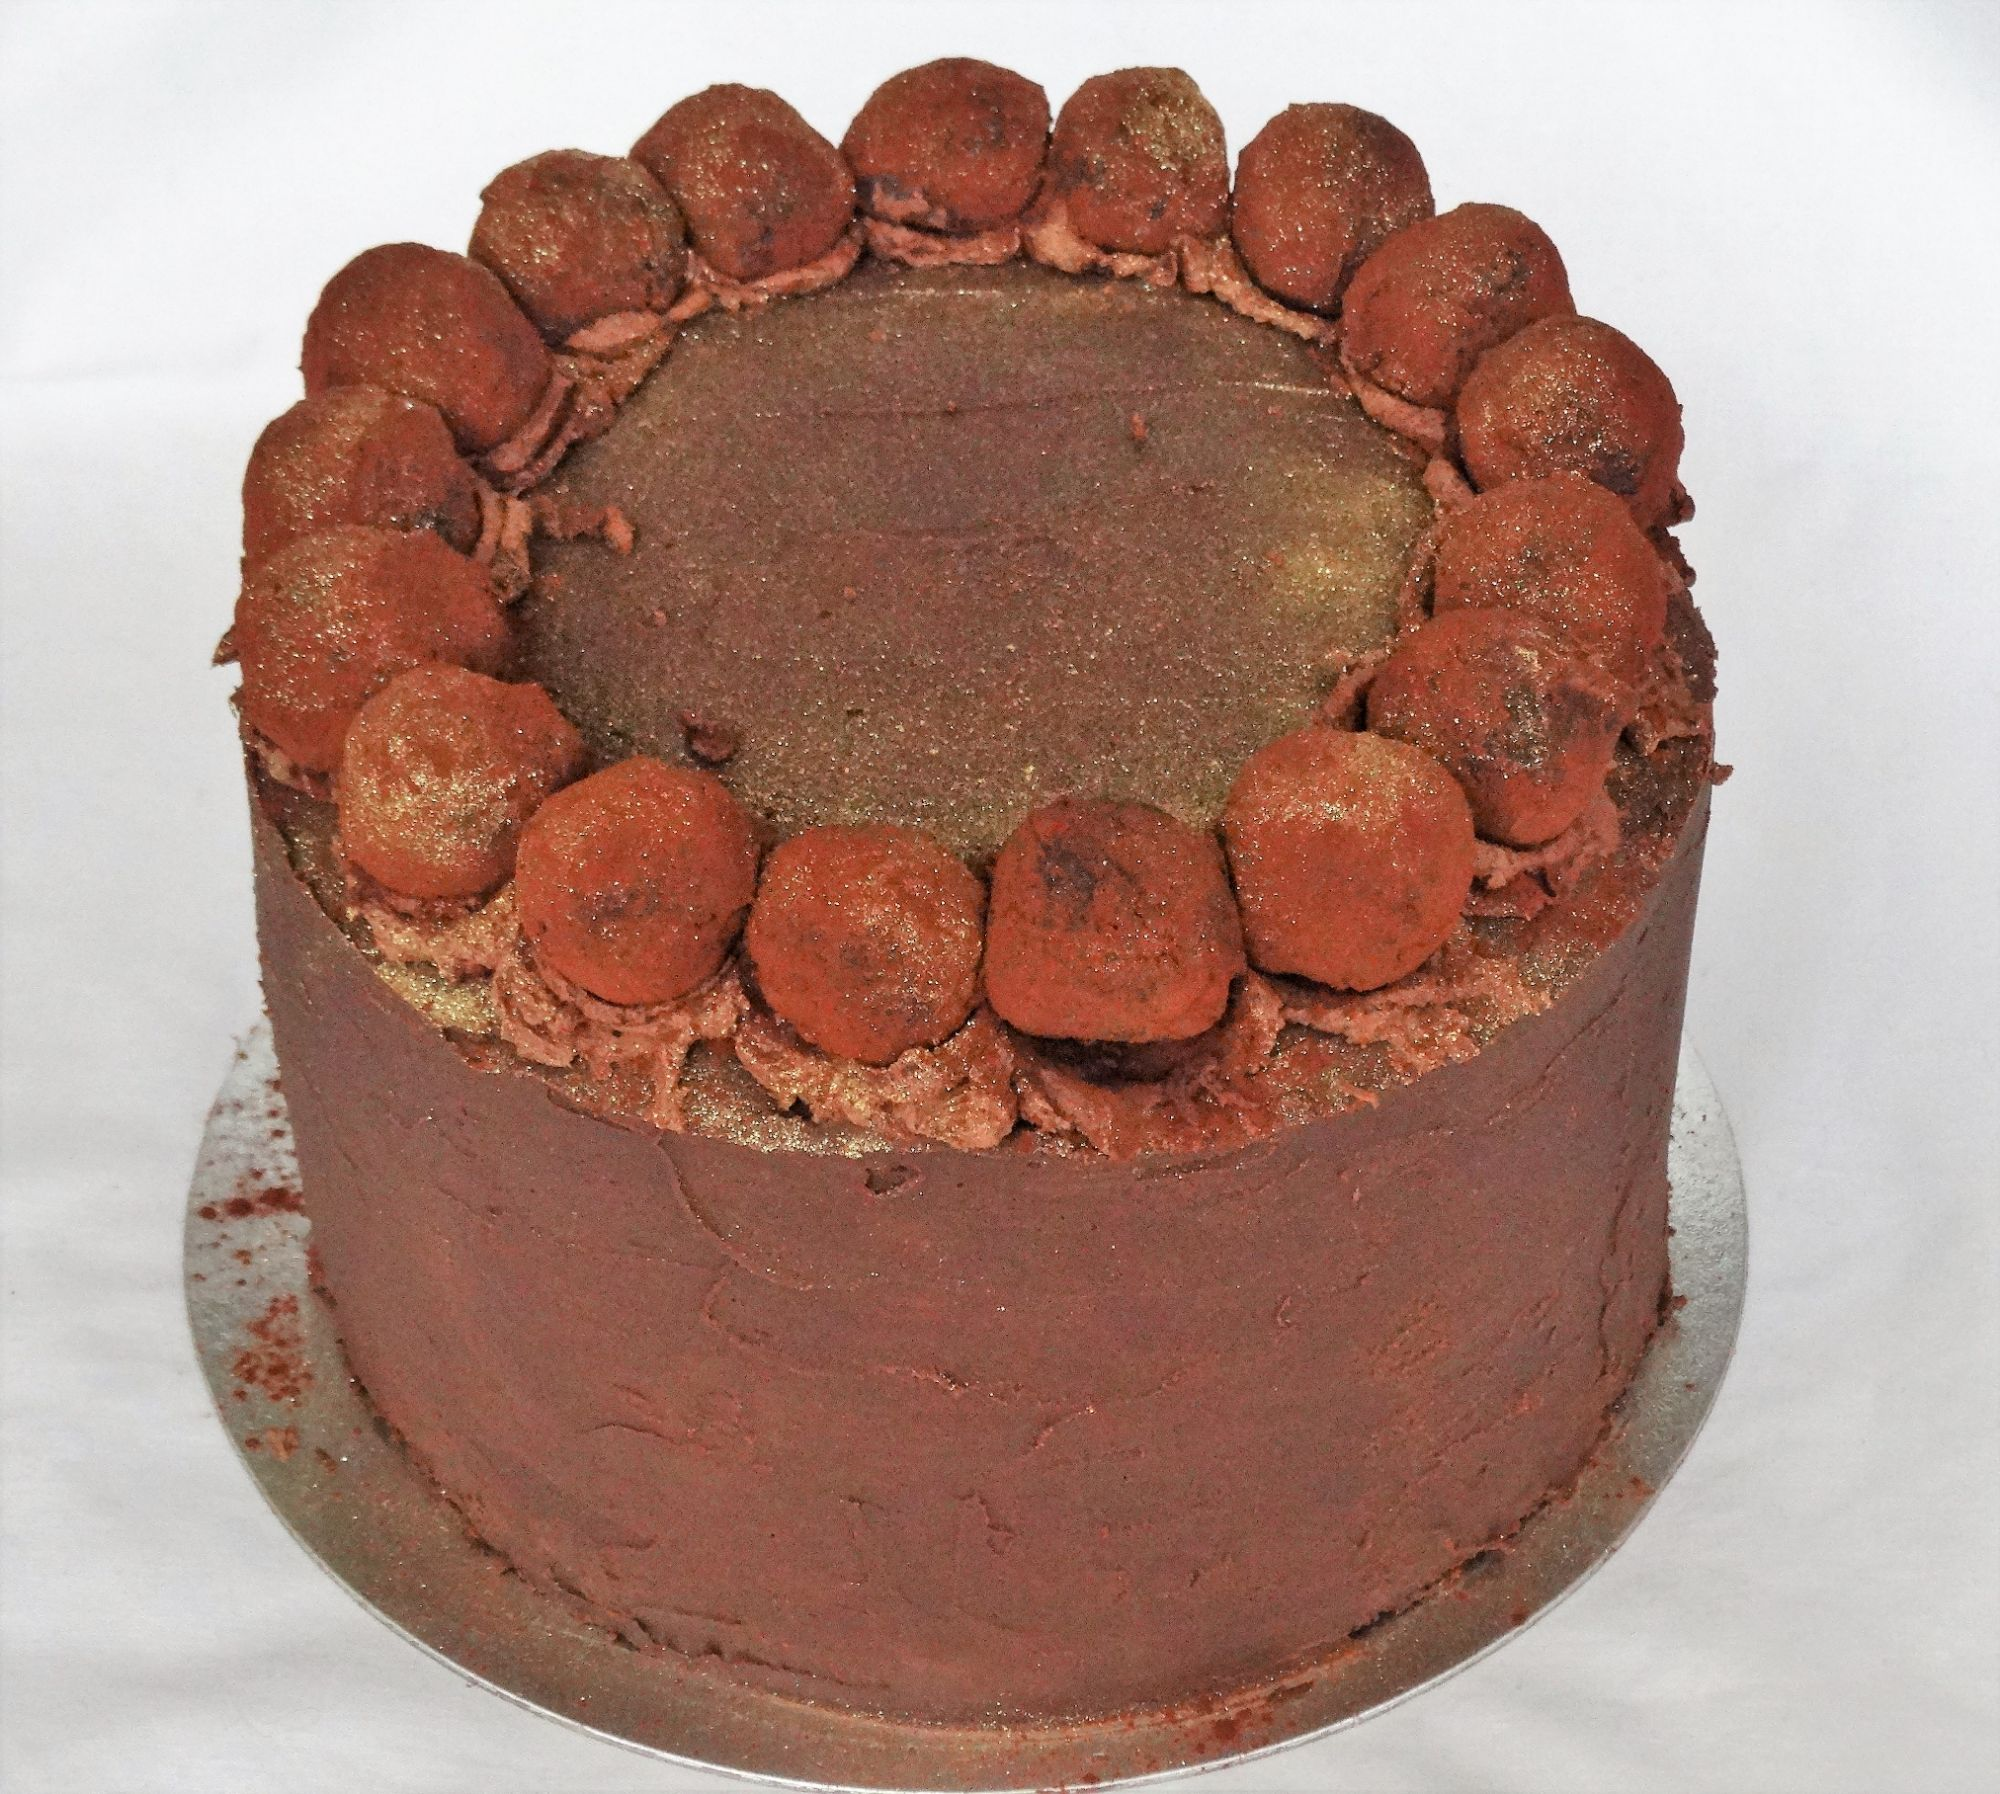 Chocolate & Marzipan Layer Cake